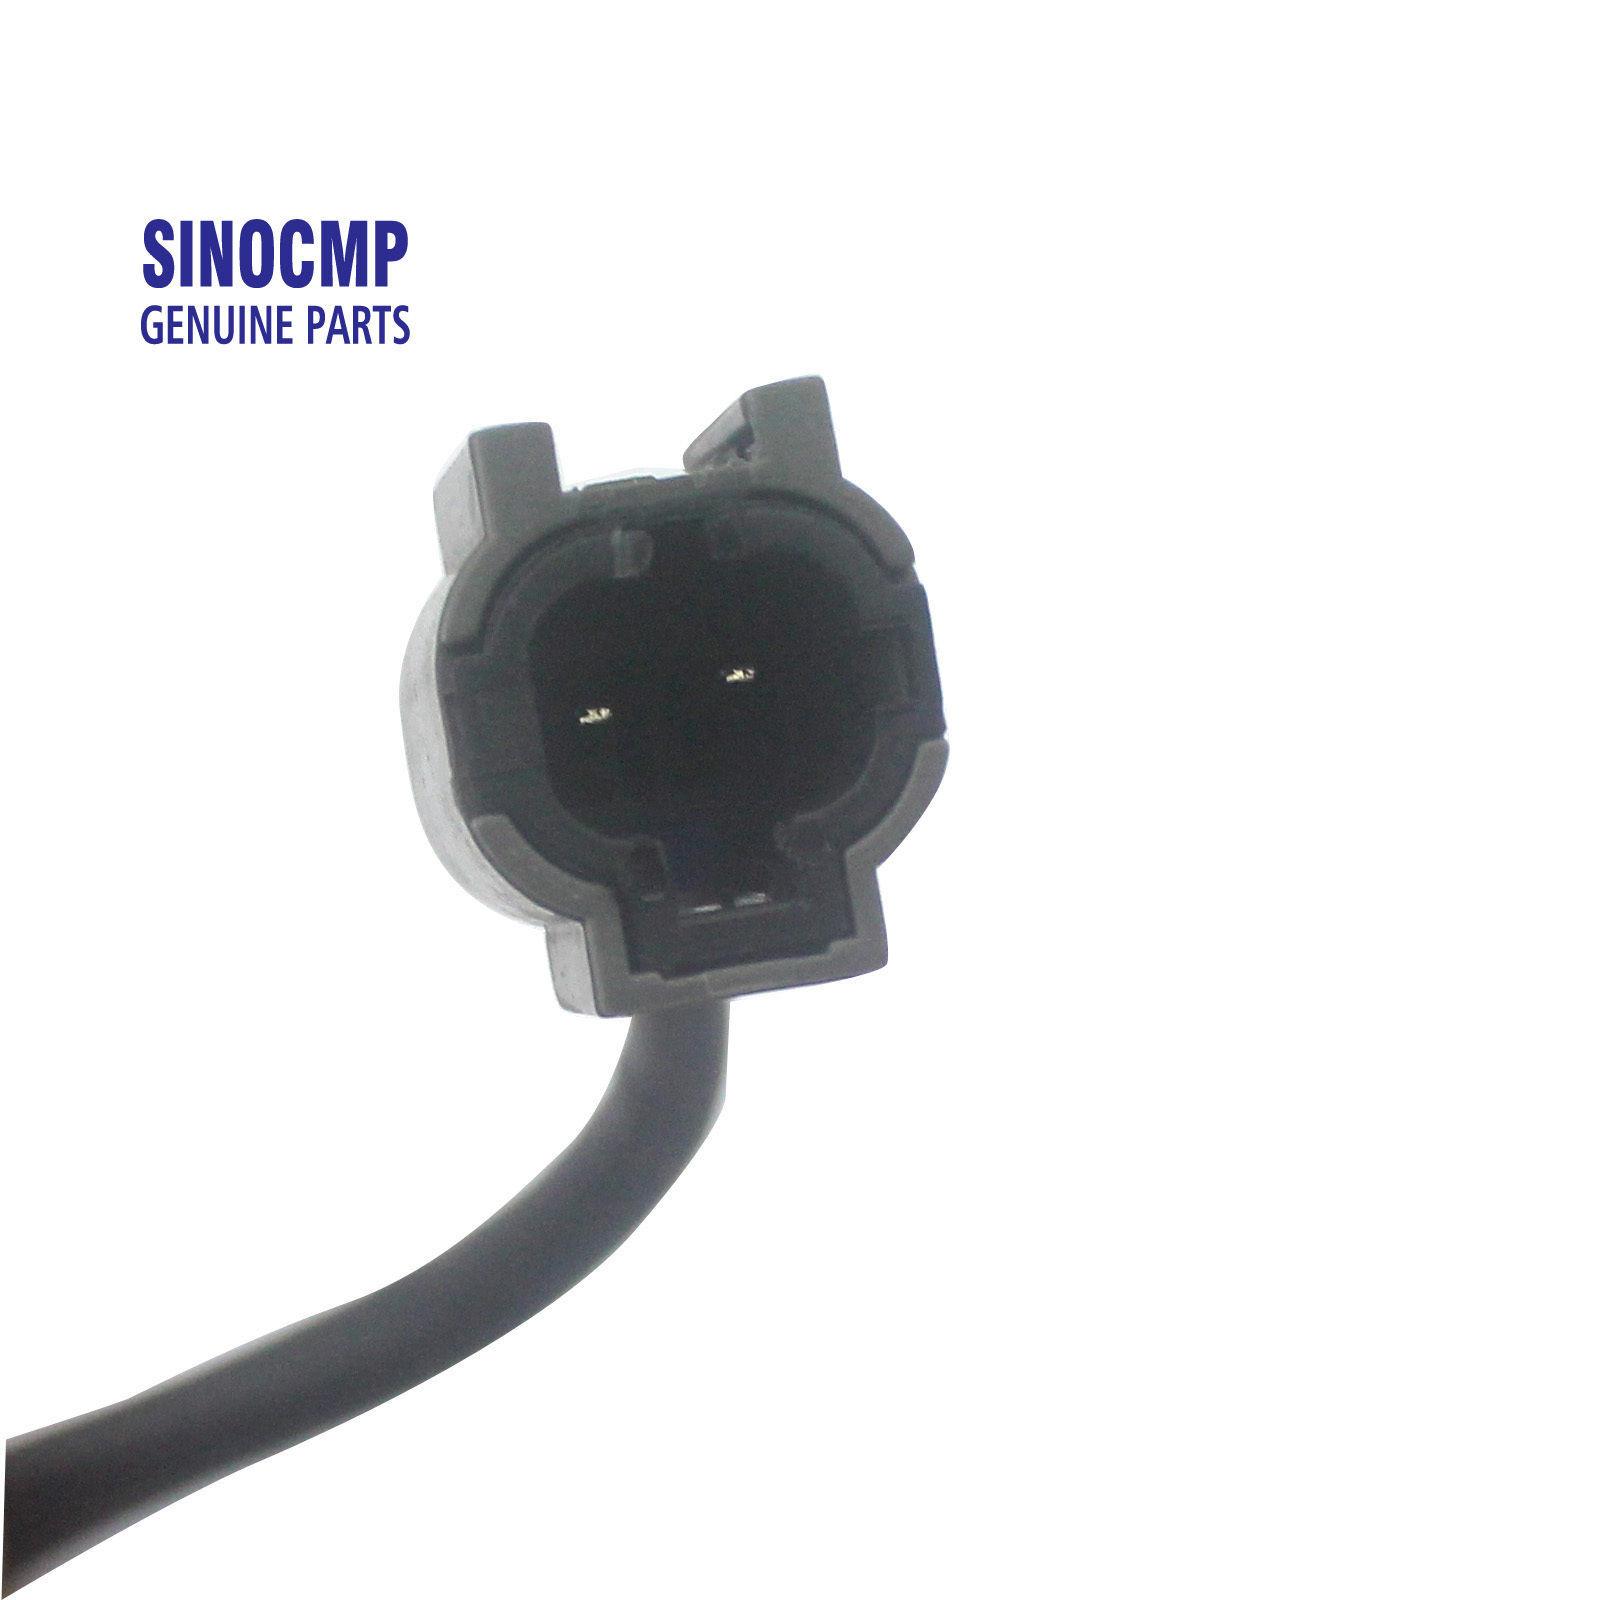 RPM Pick-up Sensor For Hitachi Zaxis ZAX ZX200-6 Excavator Parts